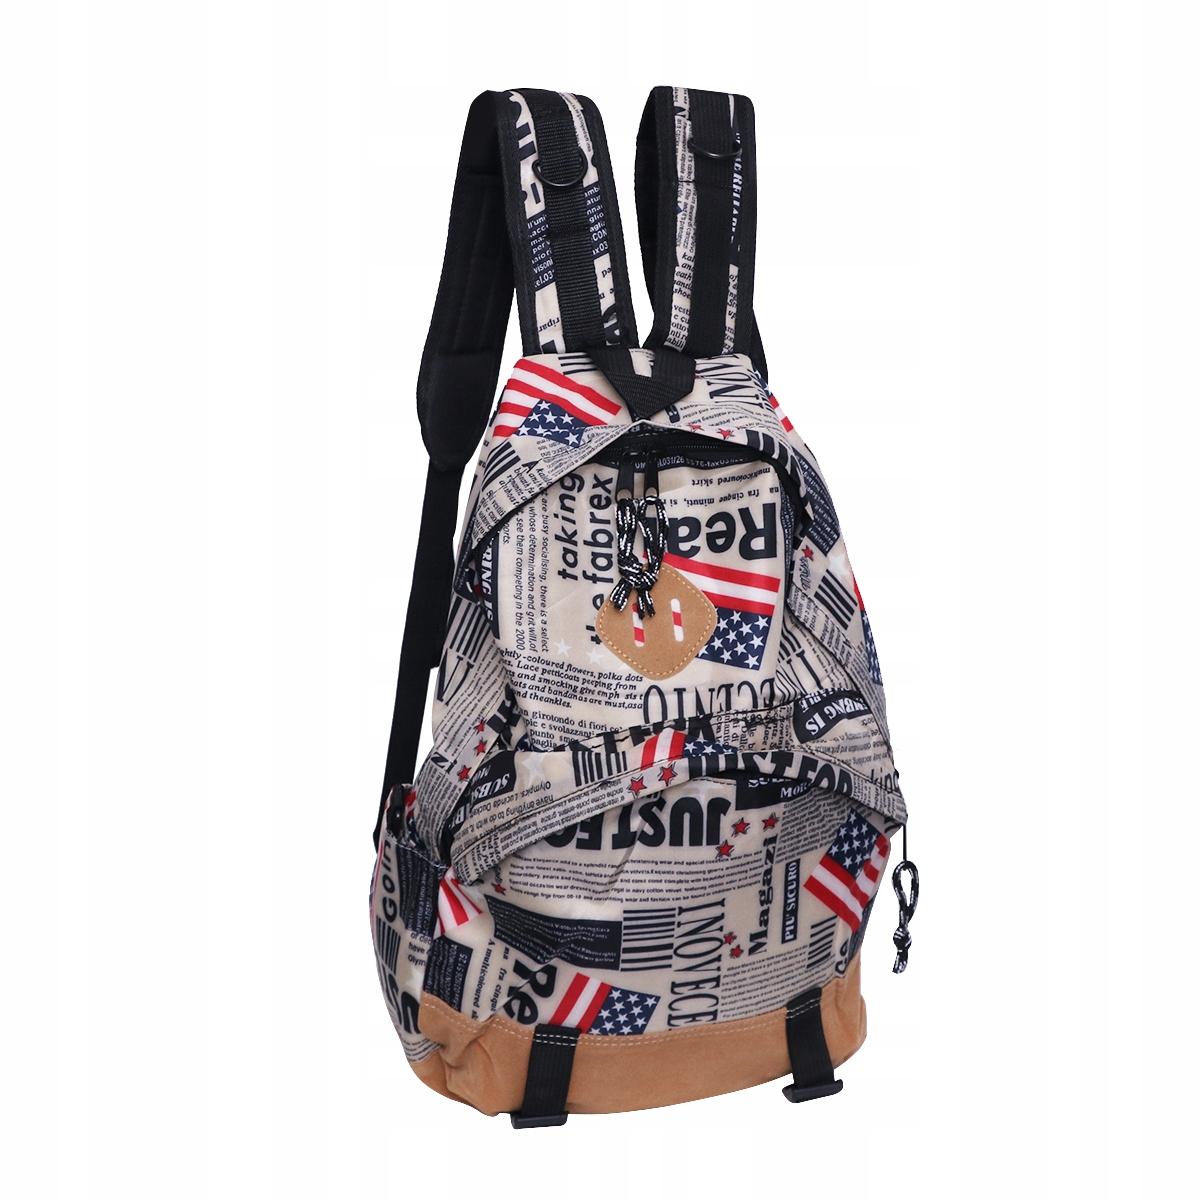 Plátená školská taška s unisex vlajkovou potlačou